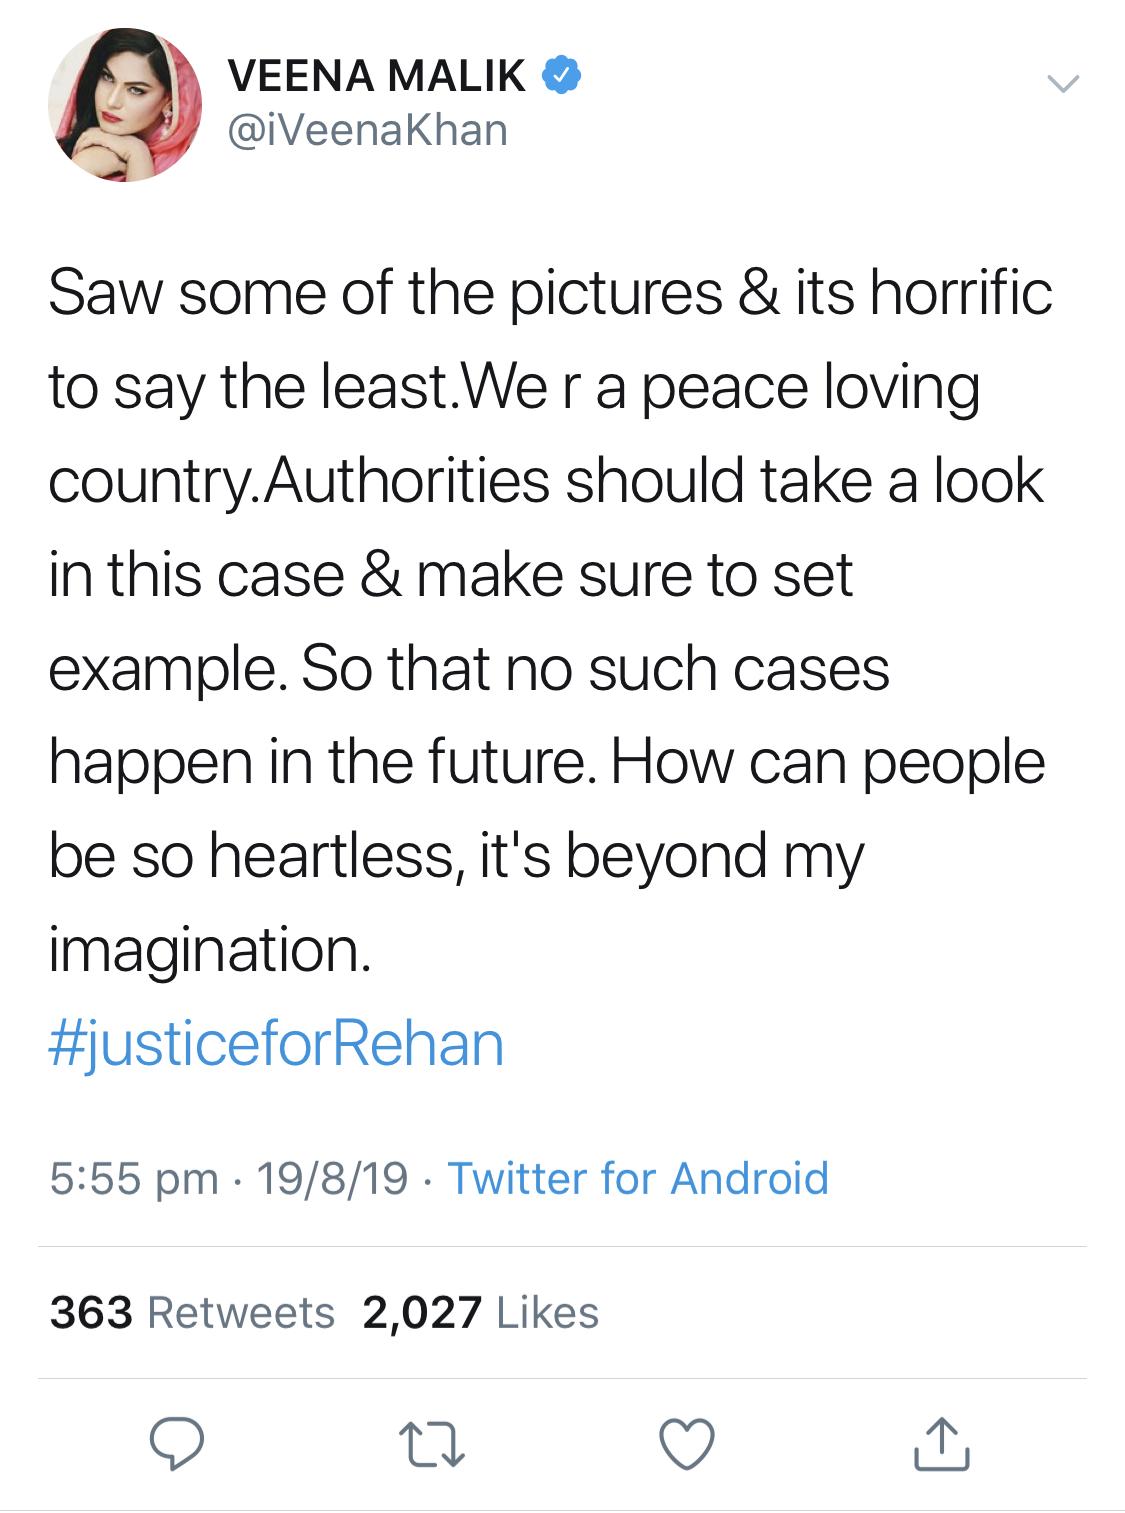 veena malik tweet for justice for rehan